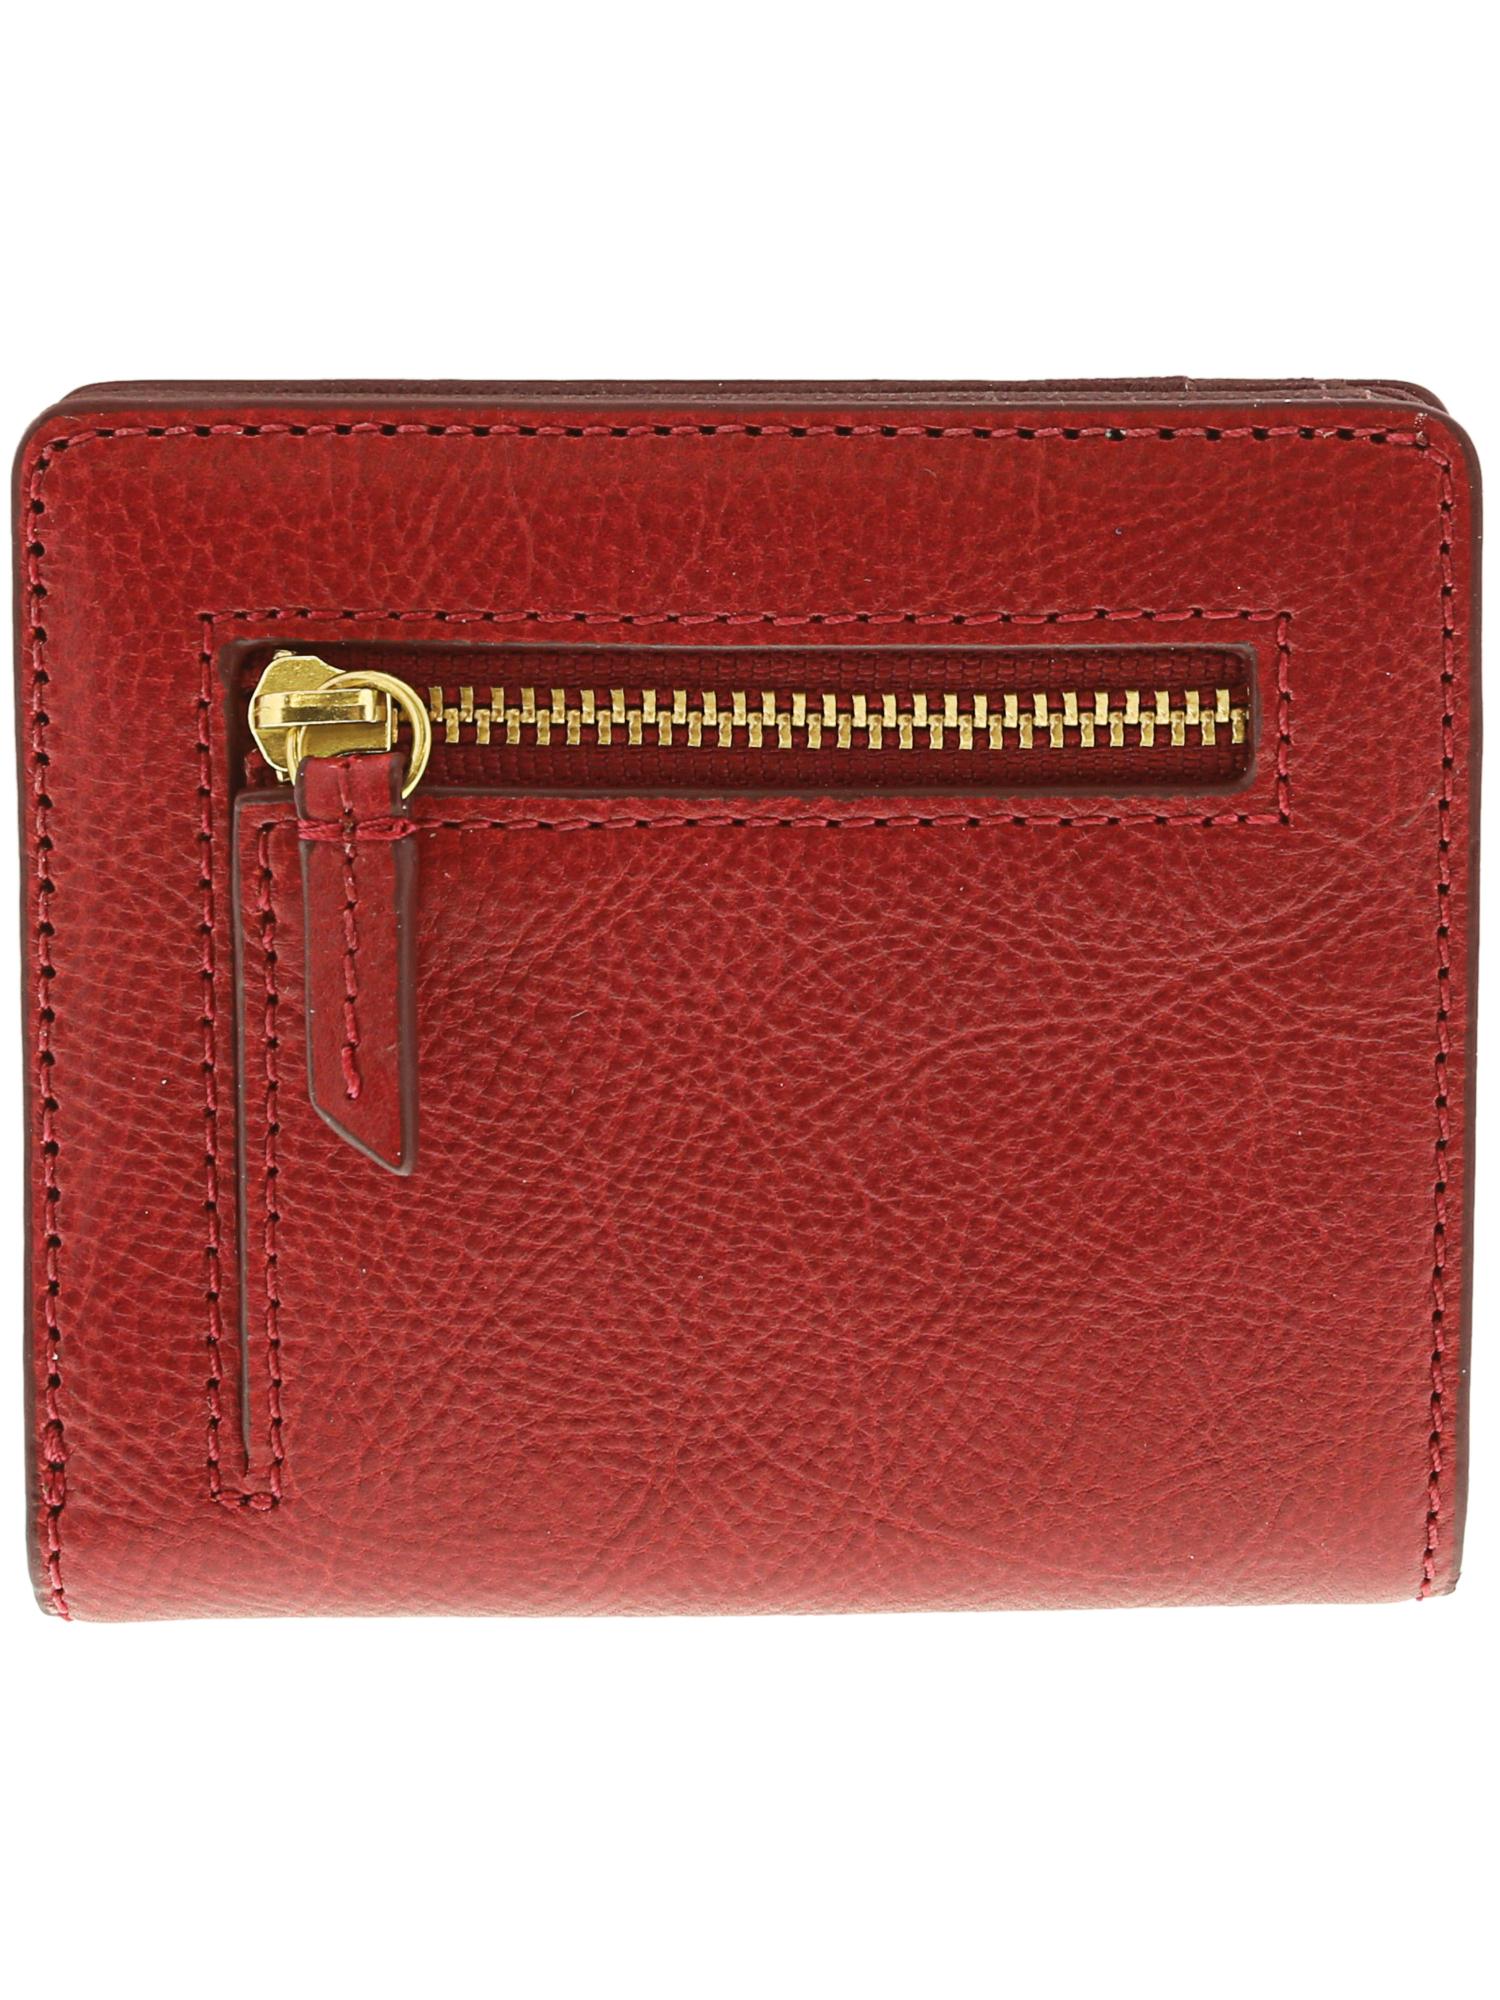 Fossil-Women-039-s-Emma-Rfid-Mini-Leather-Wallet thumbnail 32